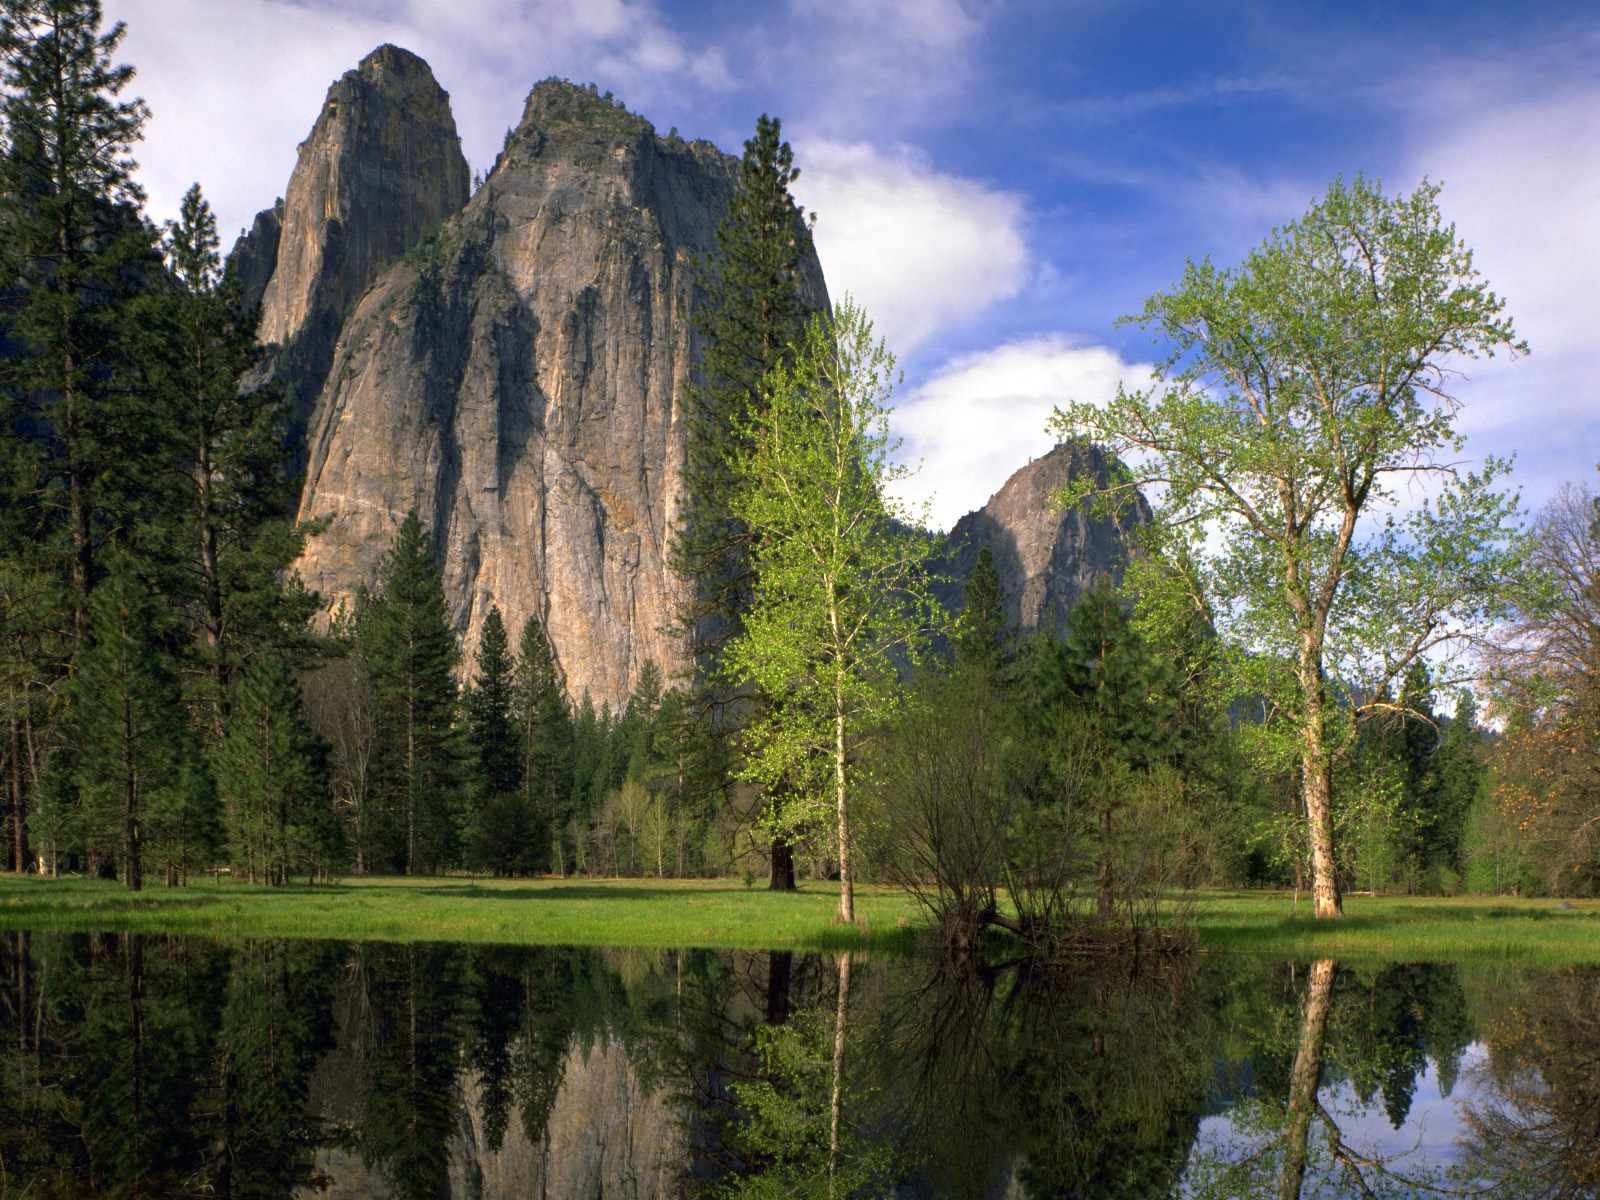 Wallpapers Unlimited: Yosemite National Park, California, USA